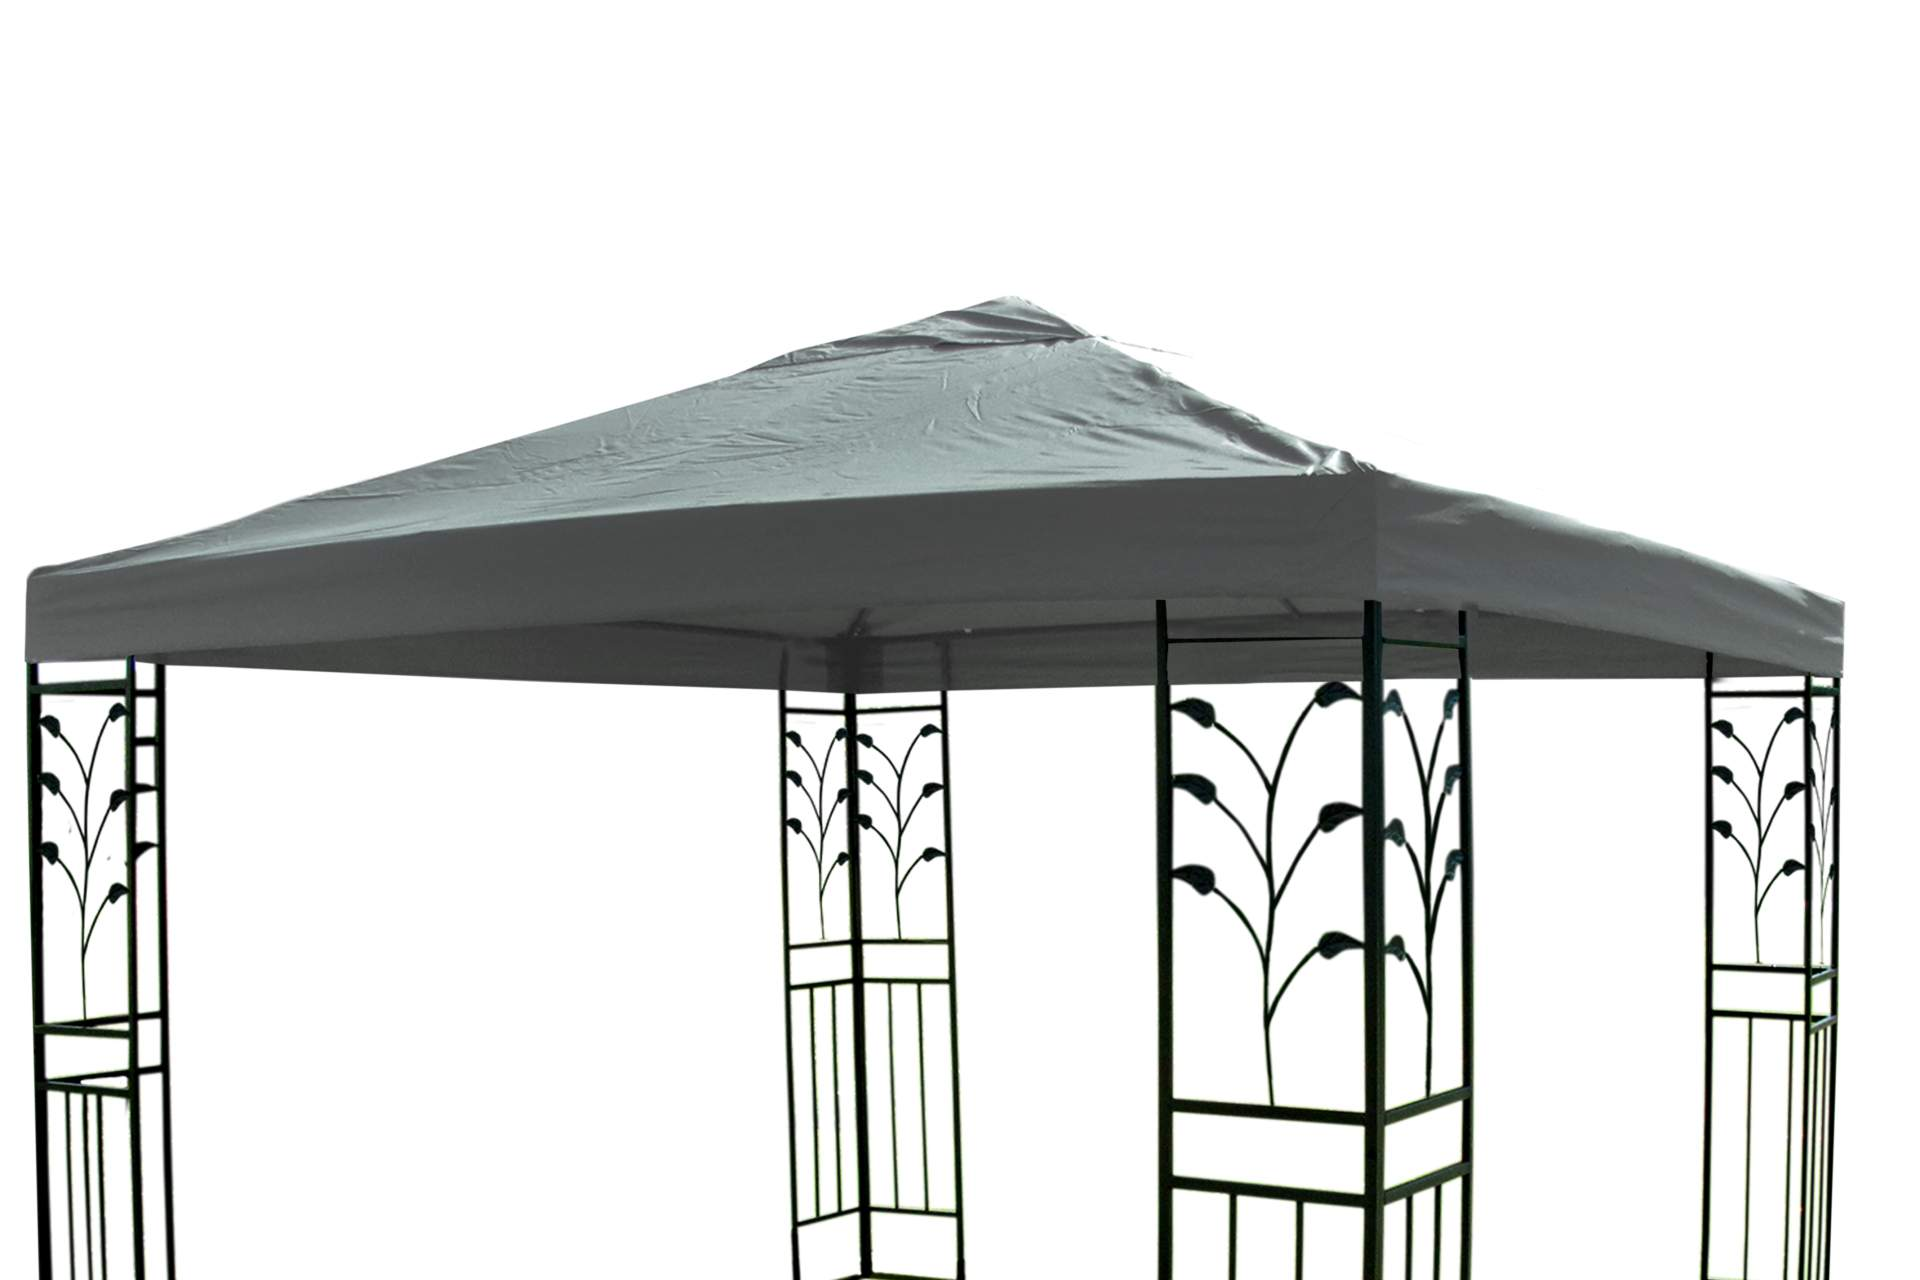 pavillon ersatzdach 3 x 3 m in grau dach pavillon pavillion partyzelt garten neu ebay. Black Bedroom Furniture Sets. Home Design Ideas